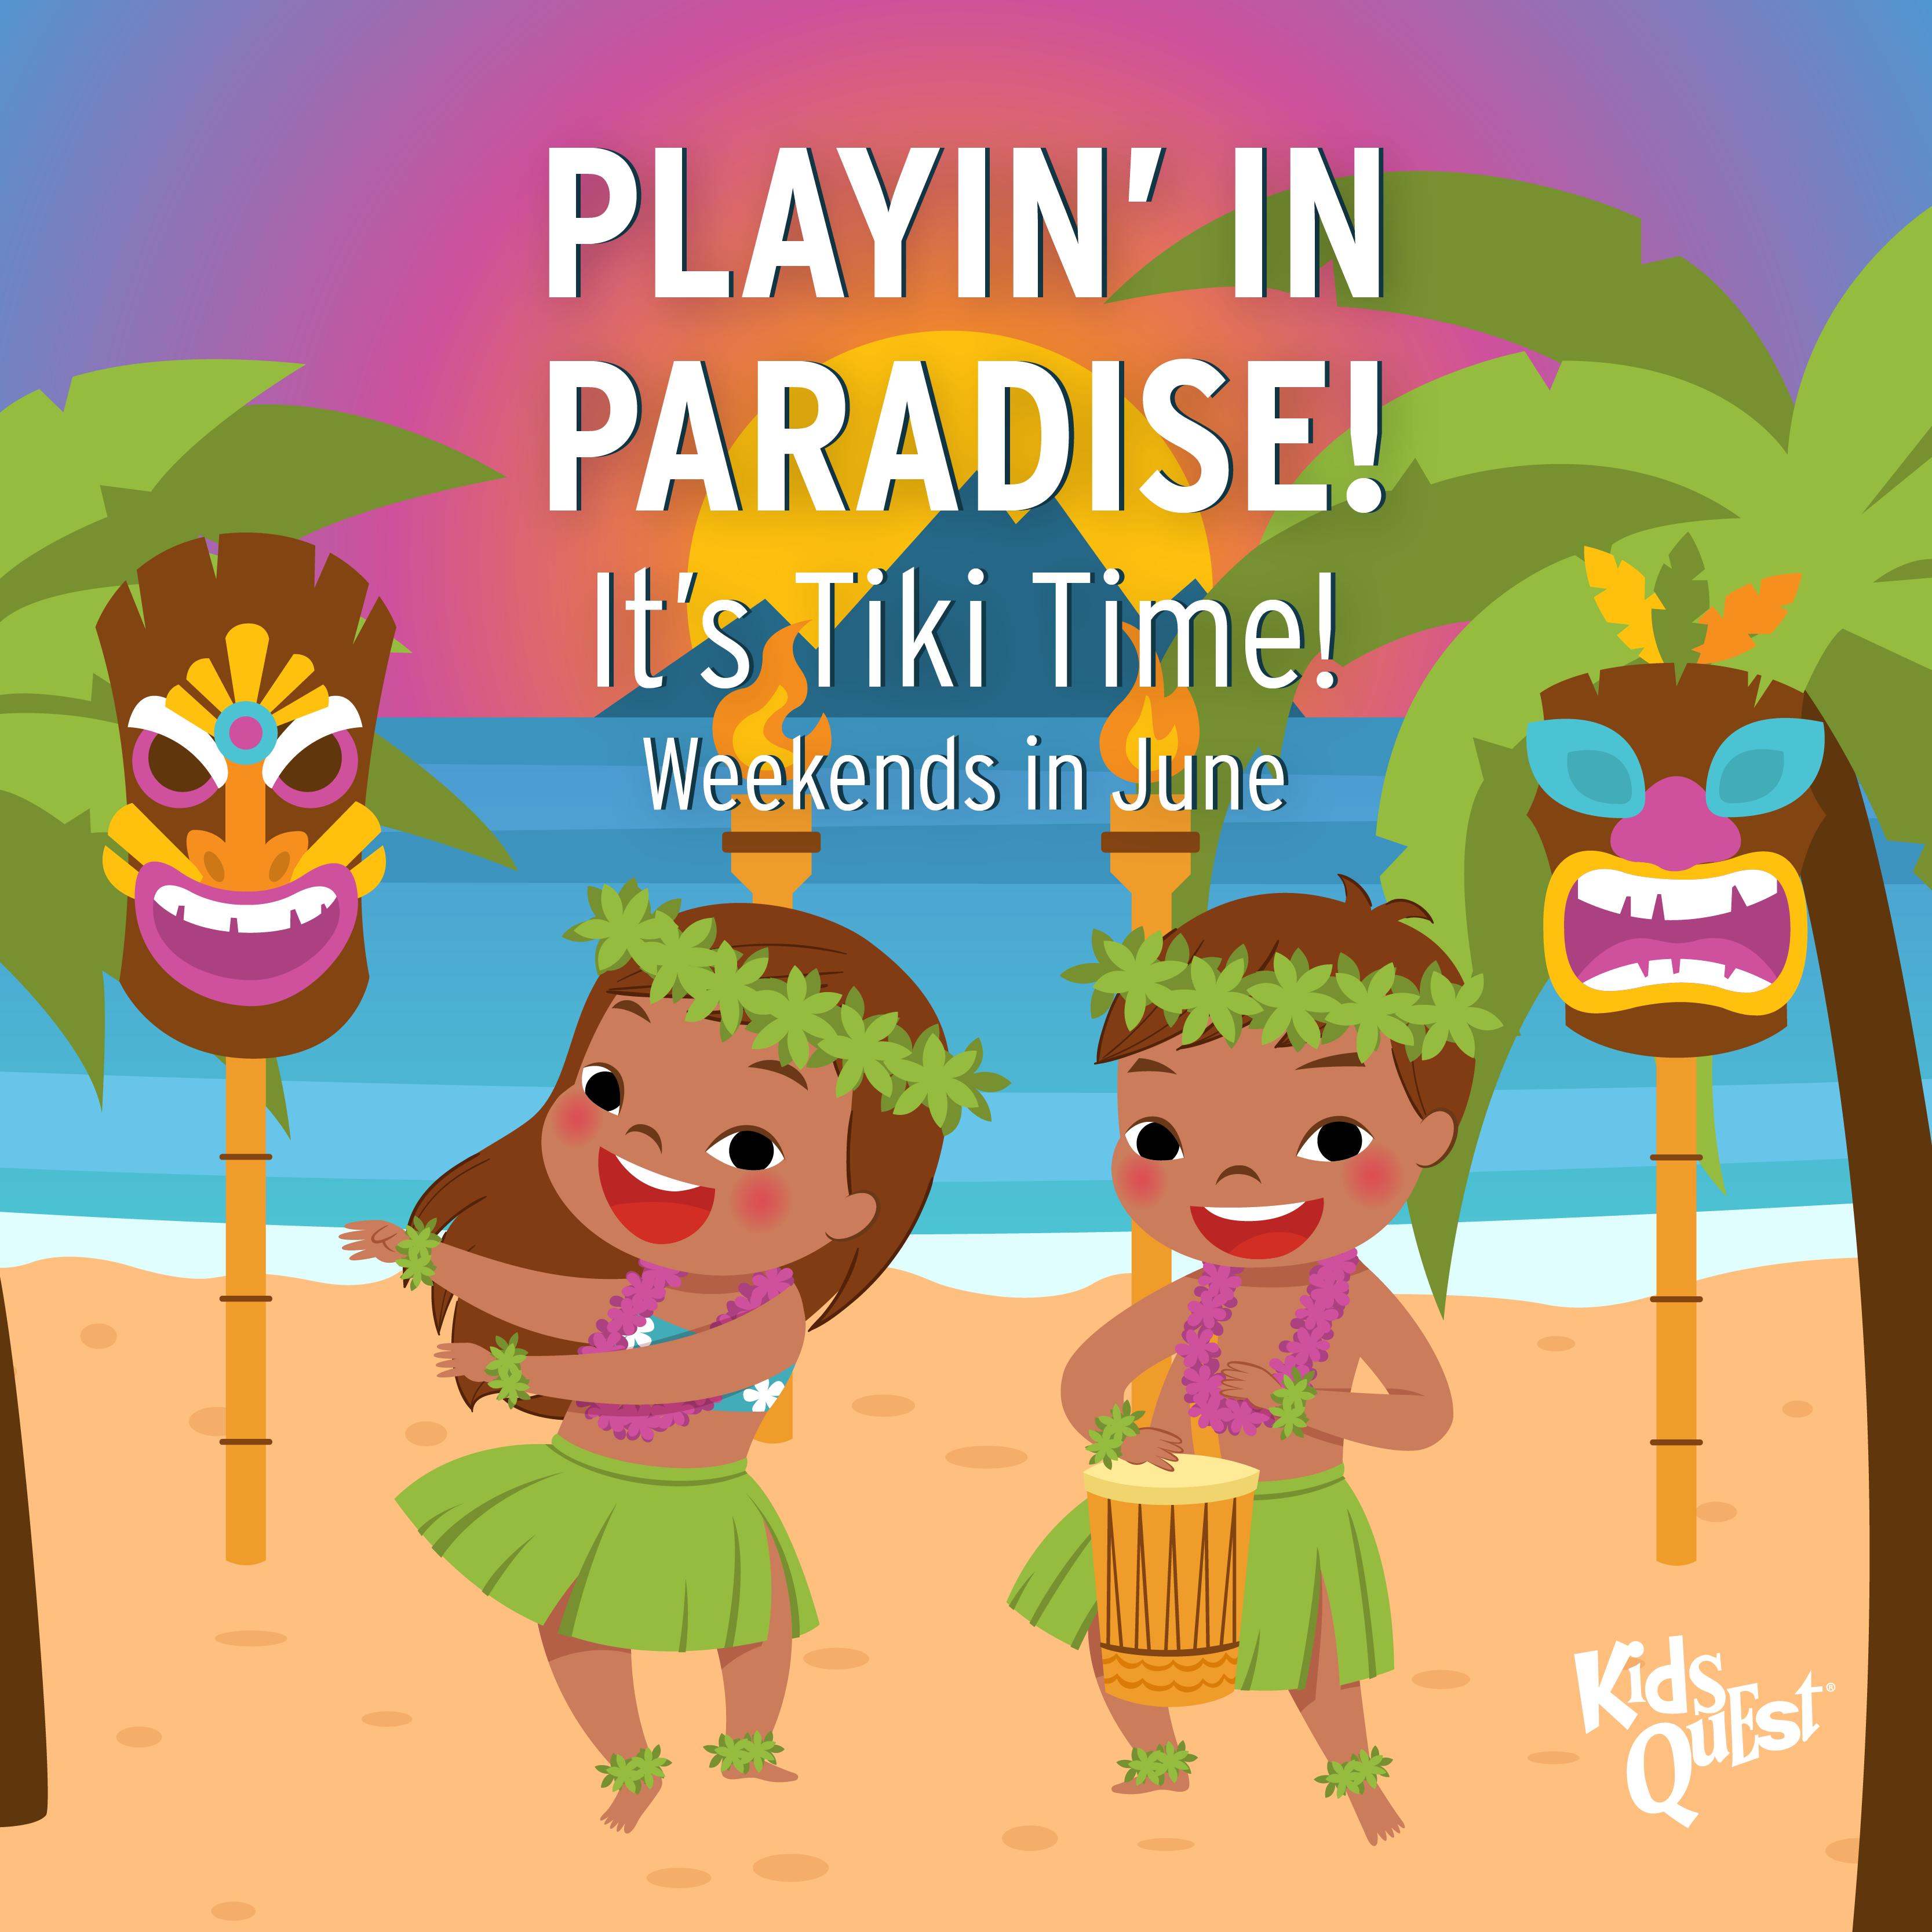 Playin' in Paradise